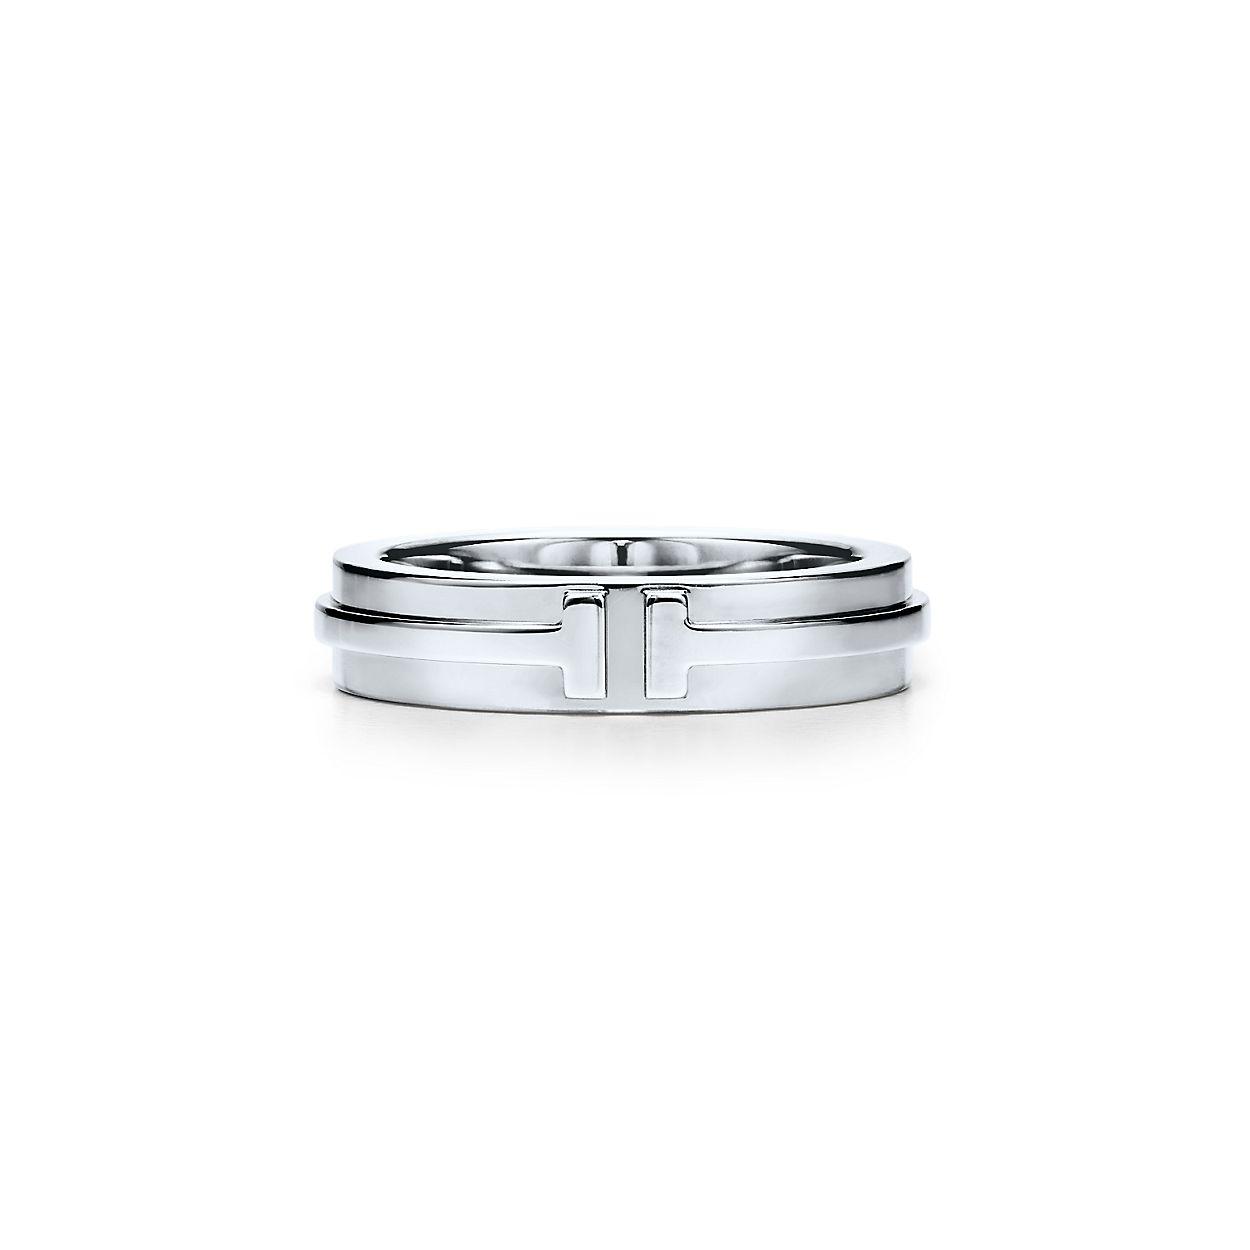 tiffany t two narrow ring in 18k white gold tiffany co